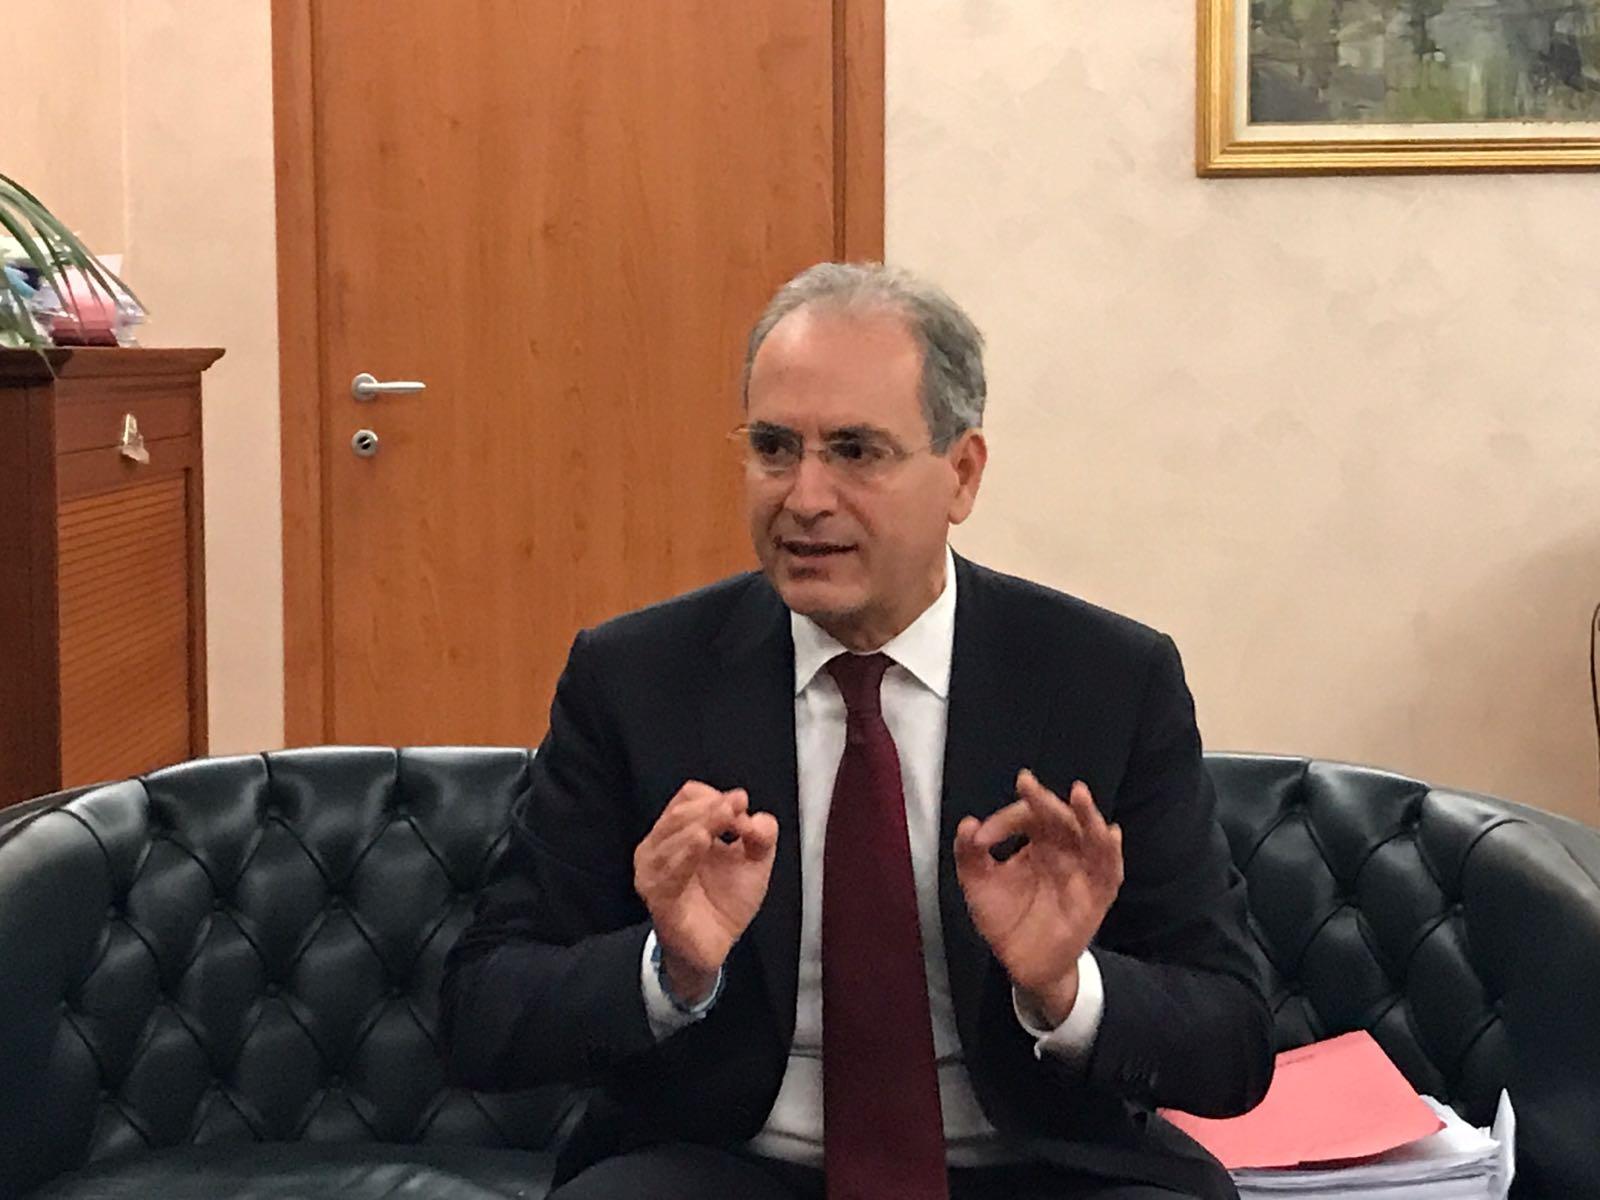 Paolo Mascaro, sindaco di Lamezia Terme - Lameziatermeit